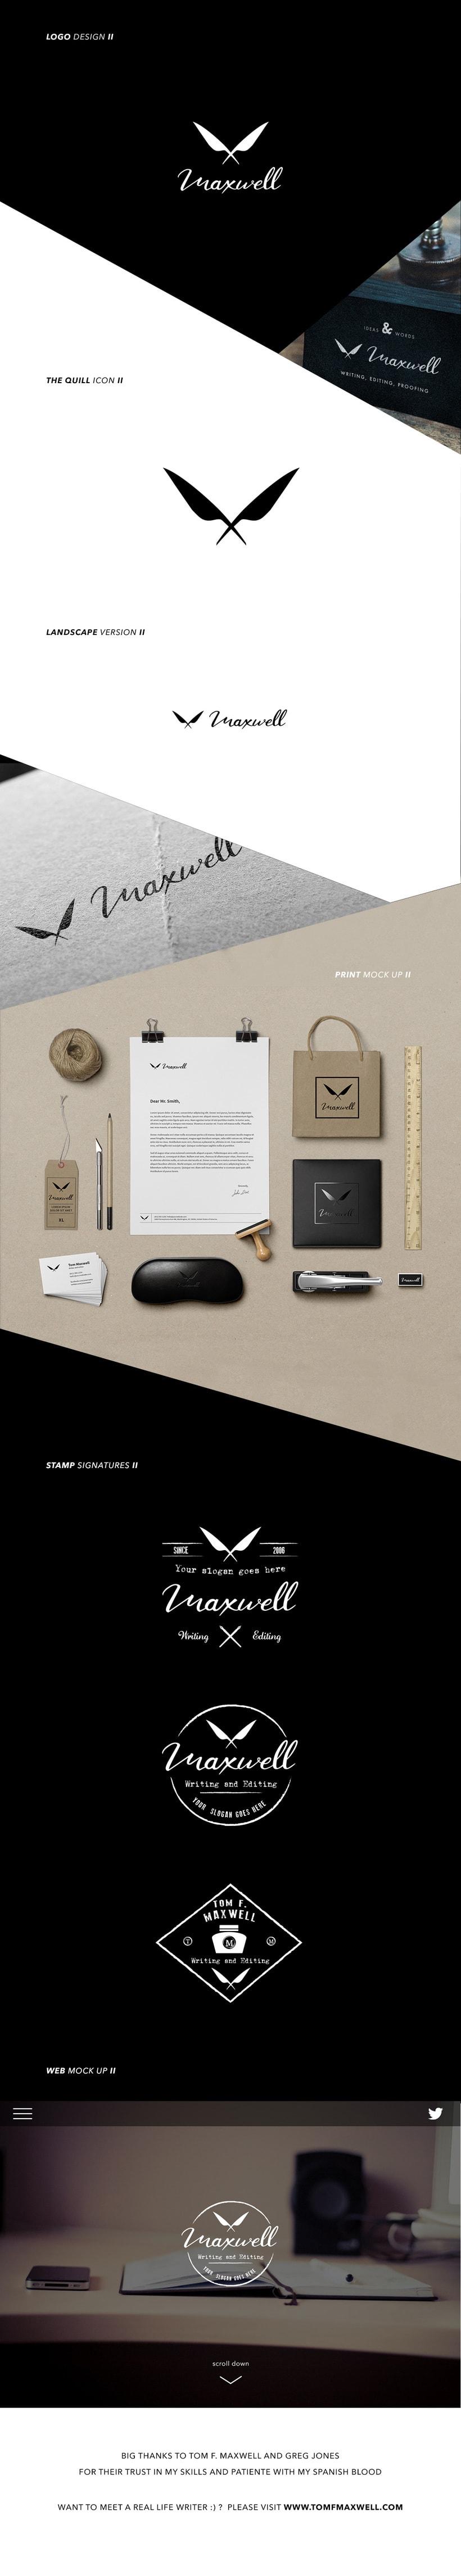 Tom Maxwell brand design -1